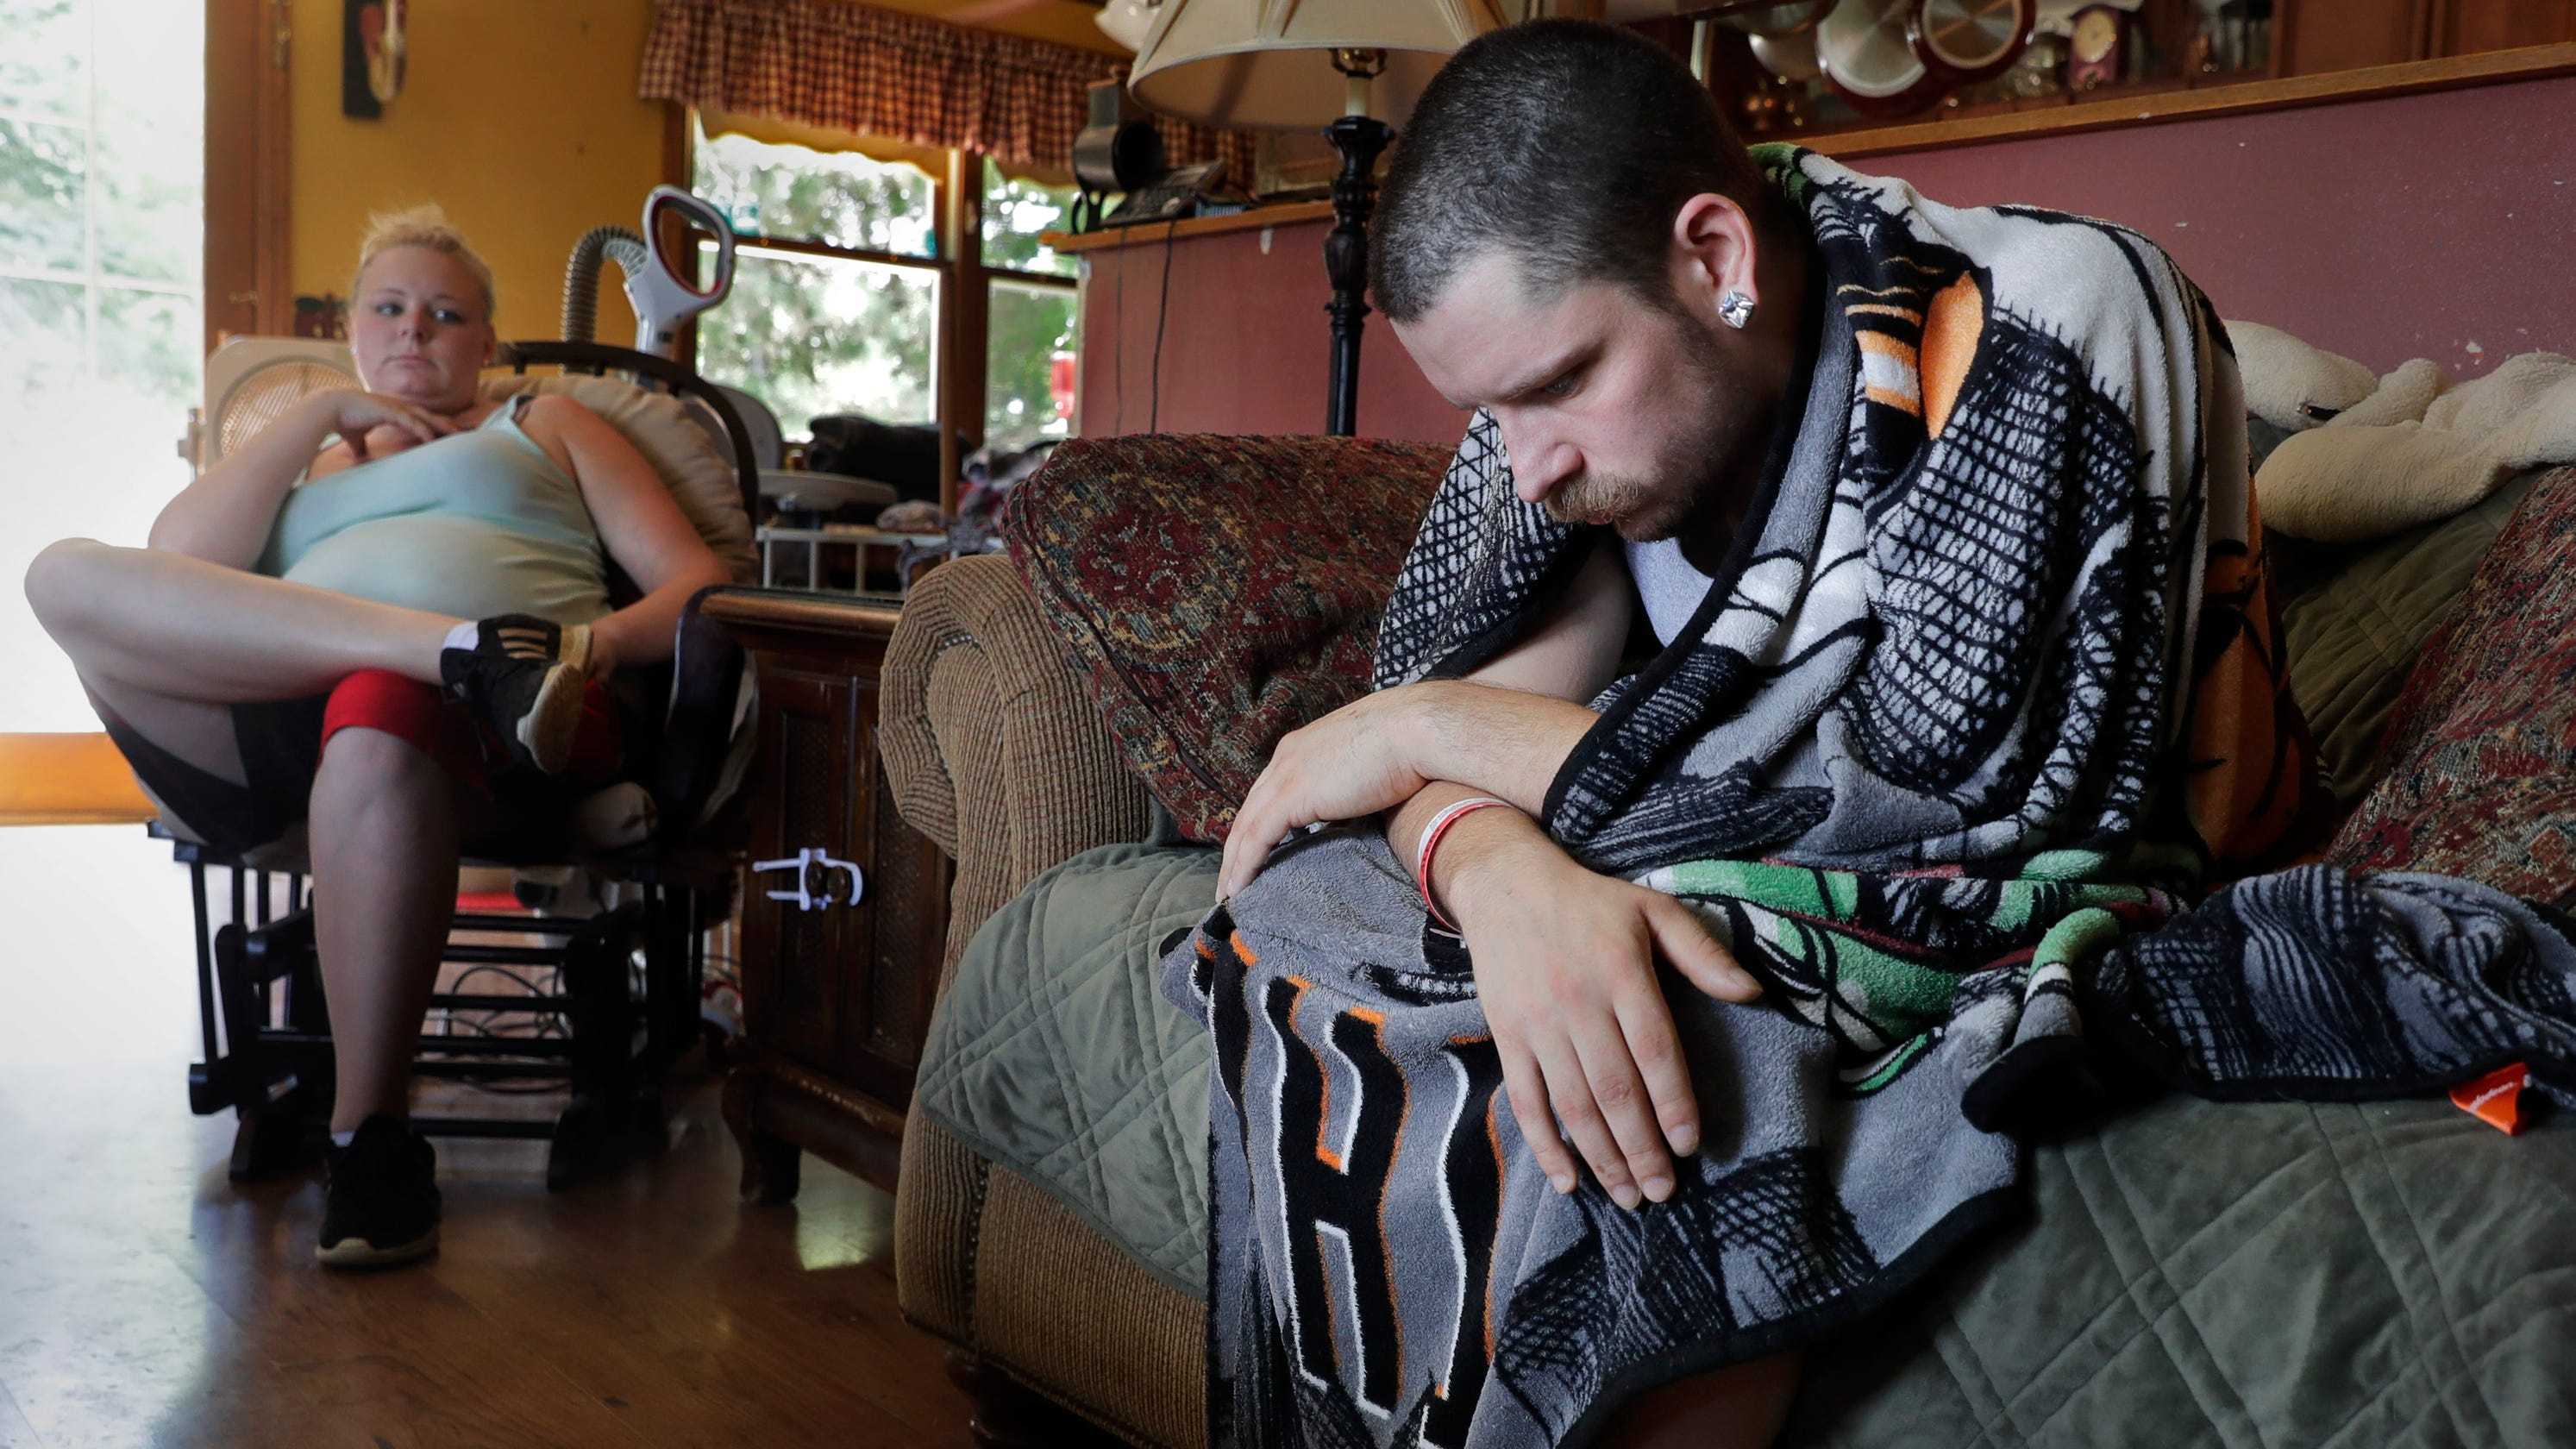 Vaping: Family of hospitalized Wisconsin man warn of dangers